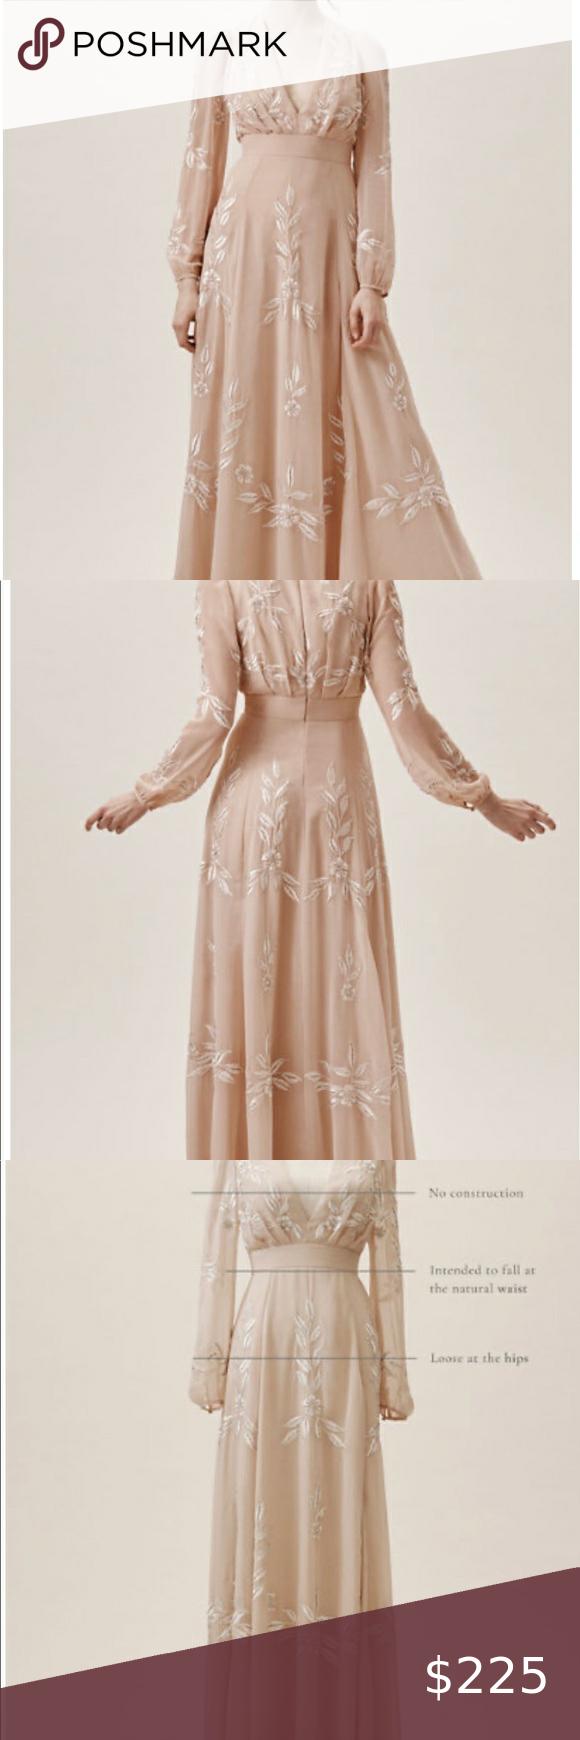 Photo of Anthropologie x BHLDN Belize dress in blush Beautiful BHLDN Belize Gown. Worn fo…